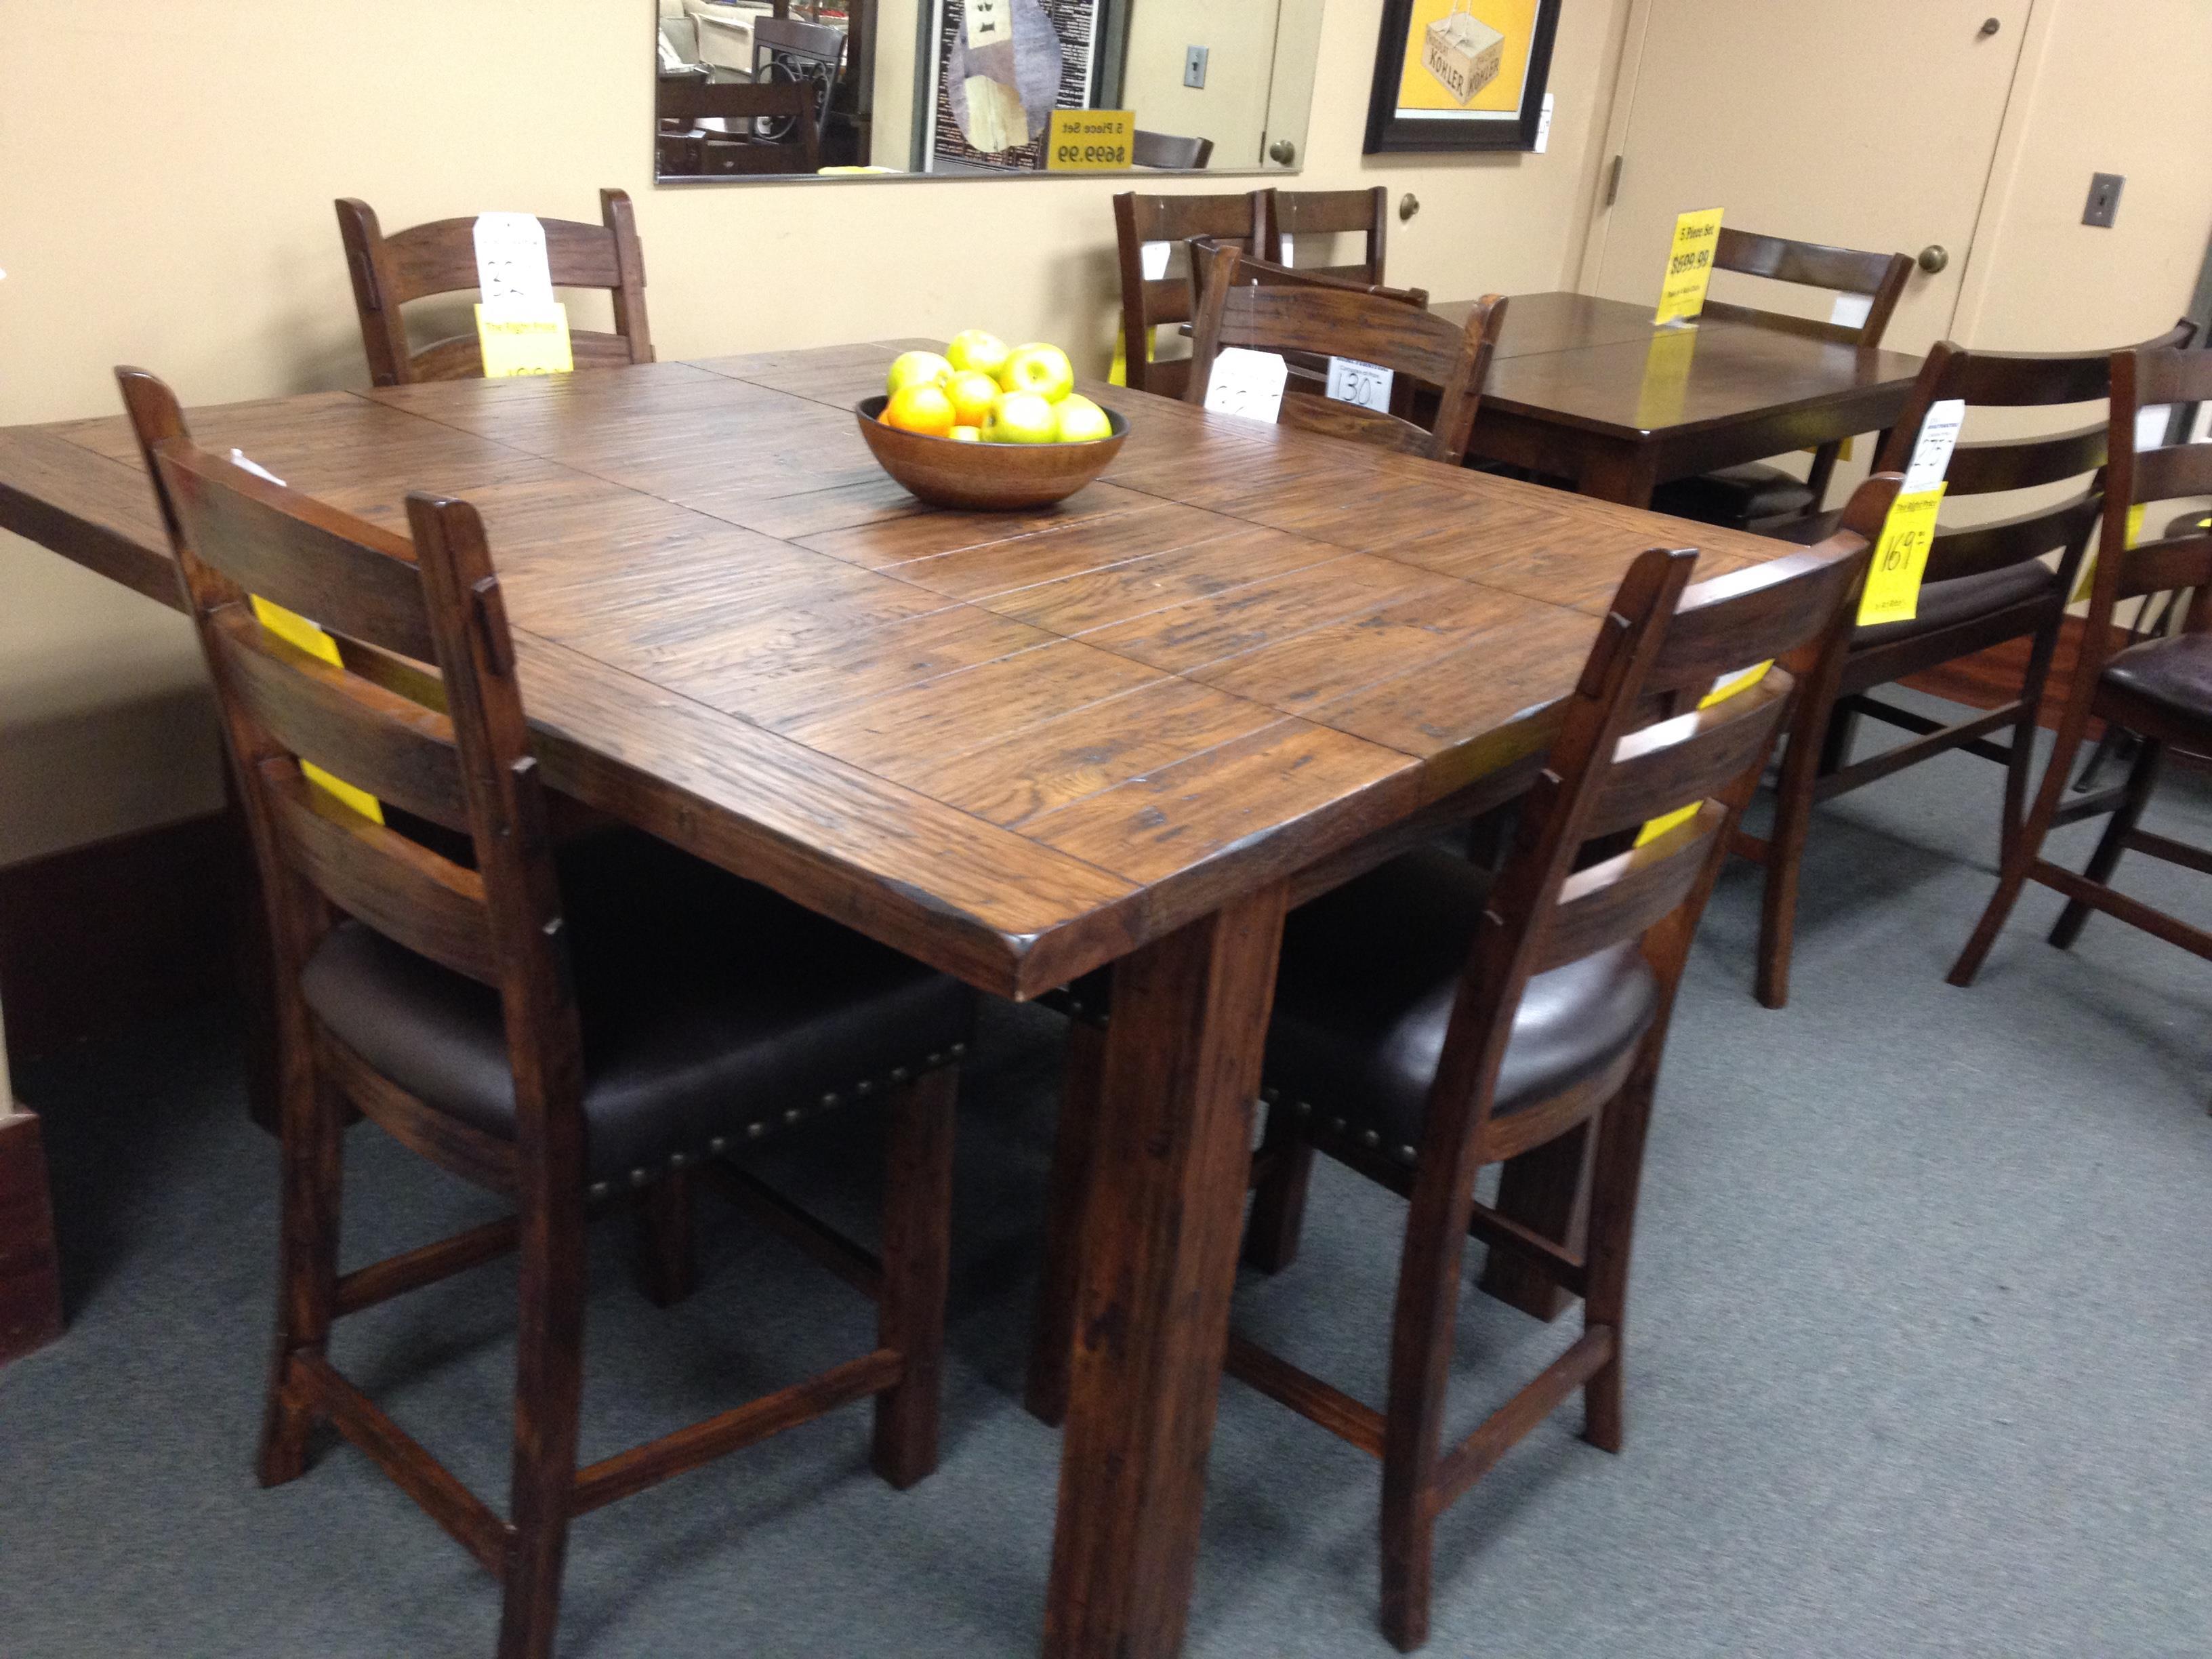 5 PC Gathering Table Set